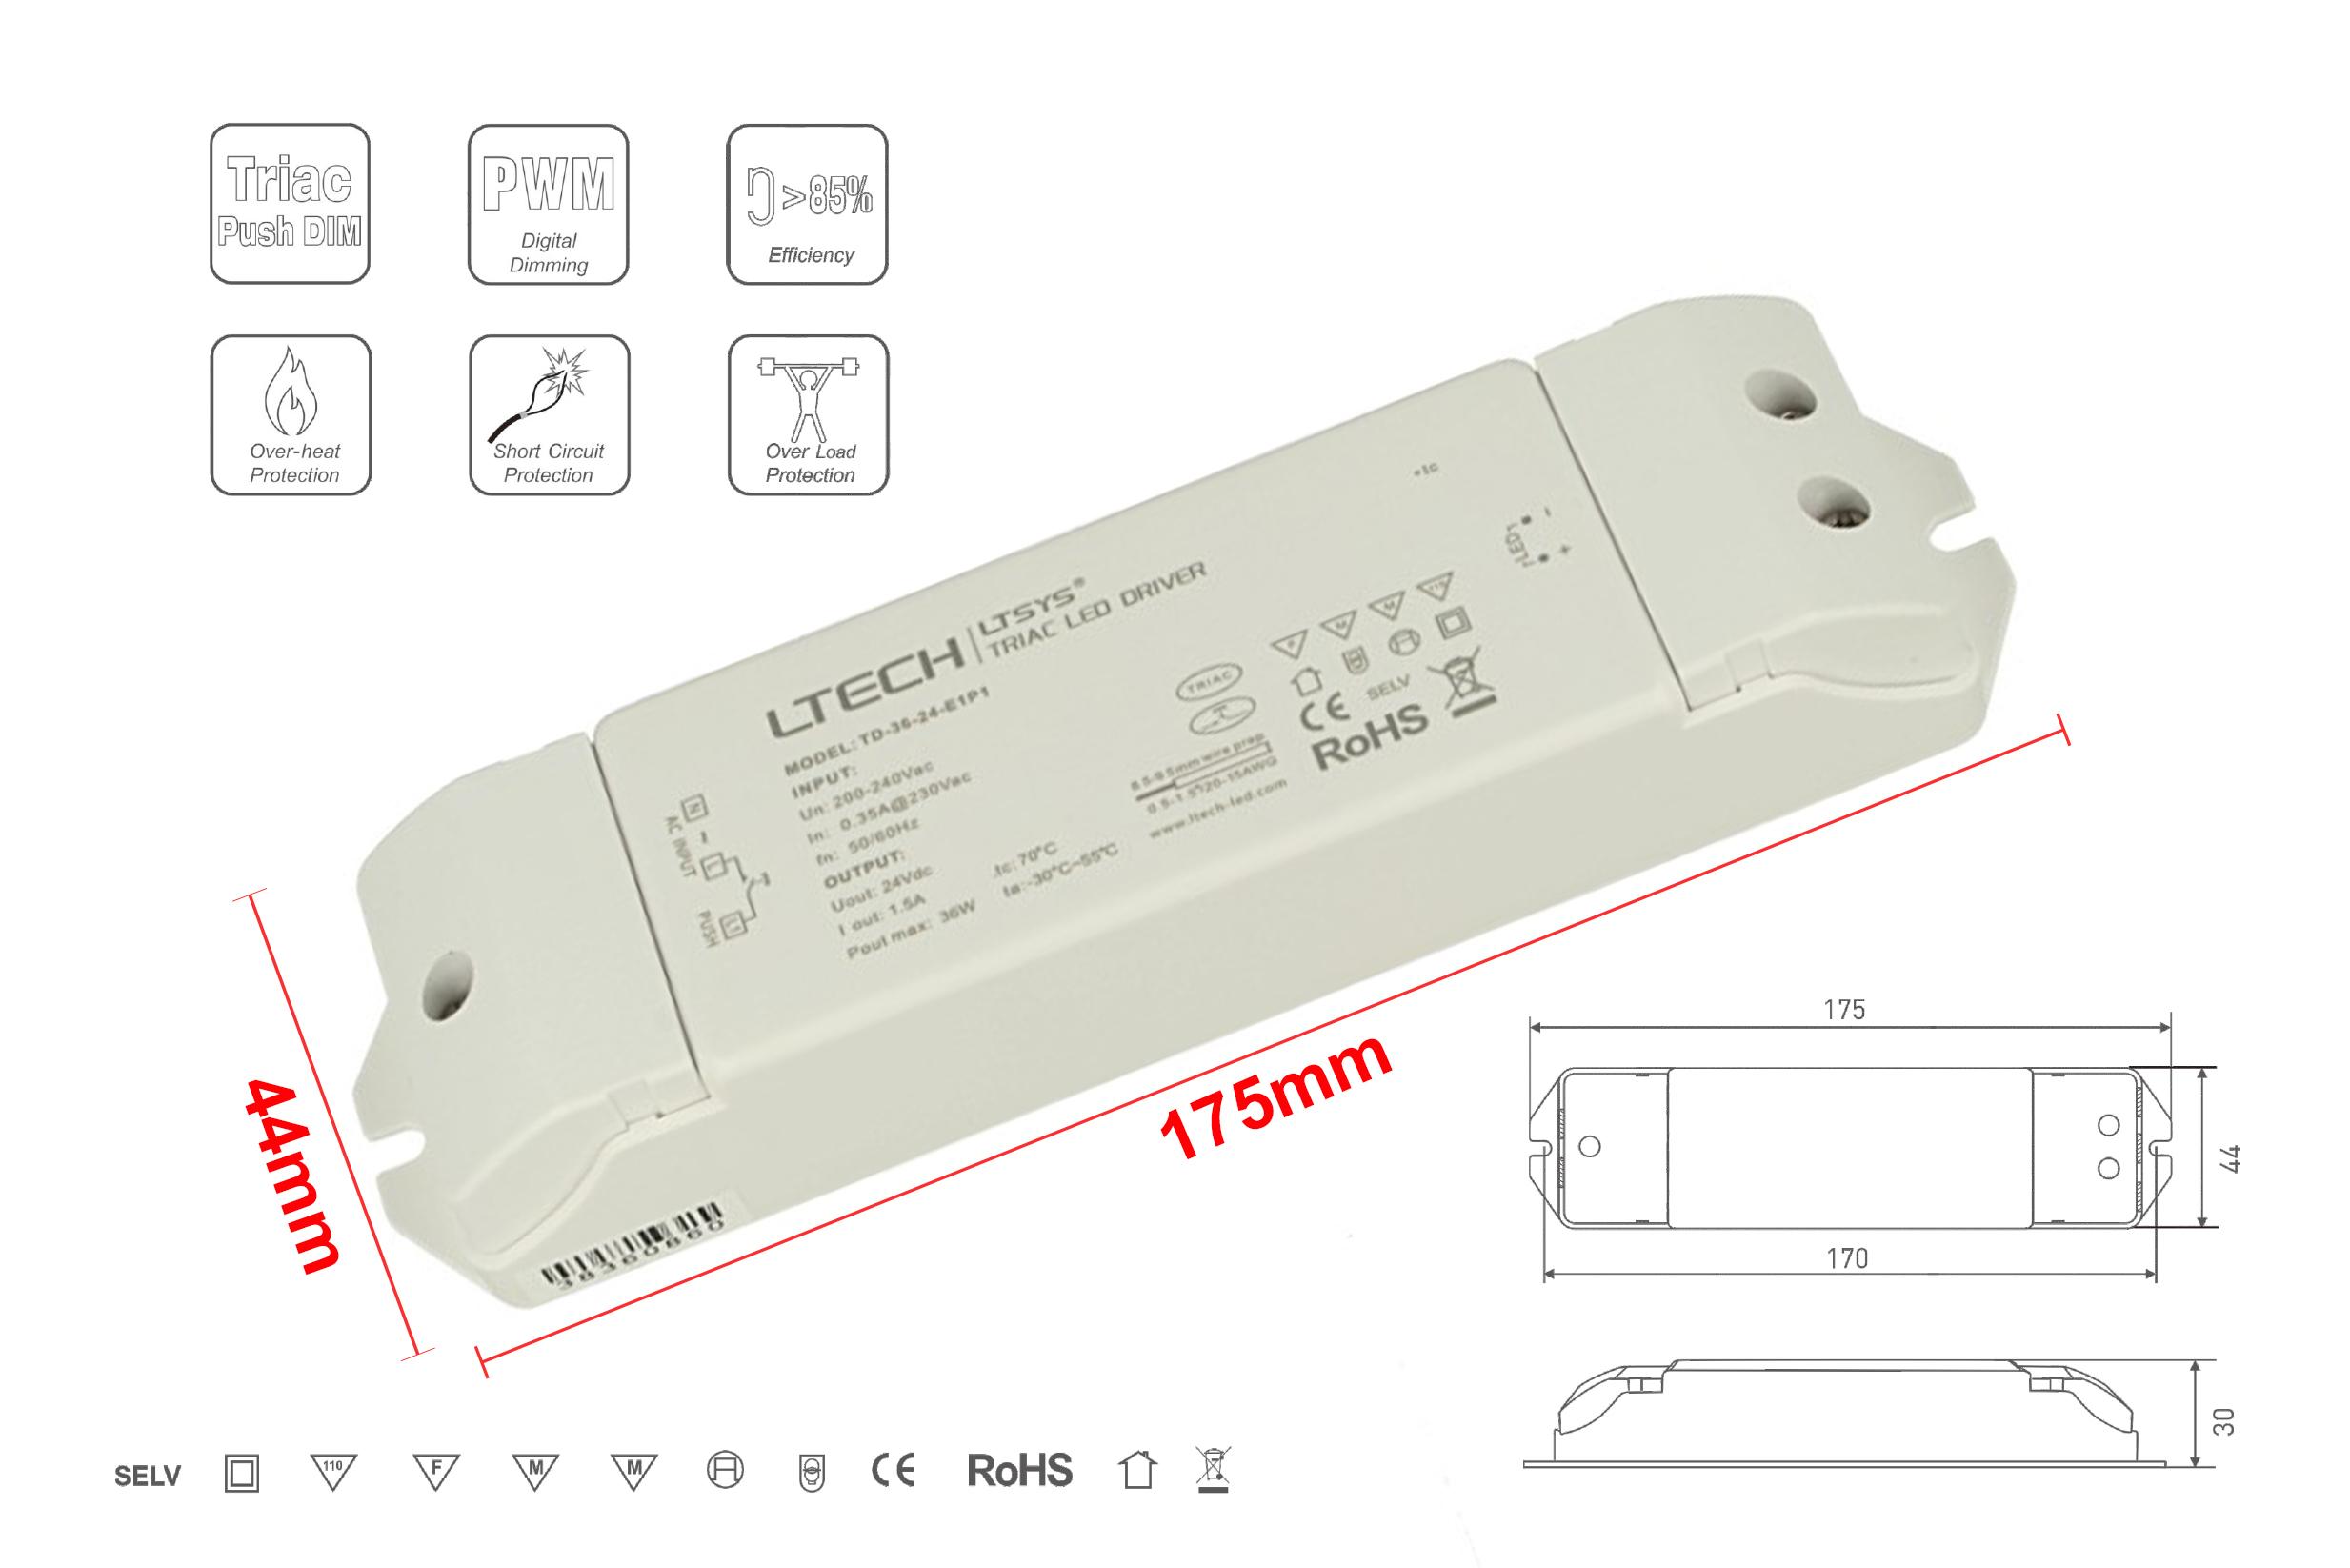 Alimentatore Dimmerabile CV 24V 36W Triac ELV Pulsante N.O. 3 In 1 Varialuce Su 220V - PZ